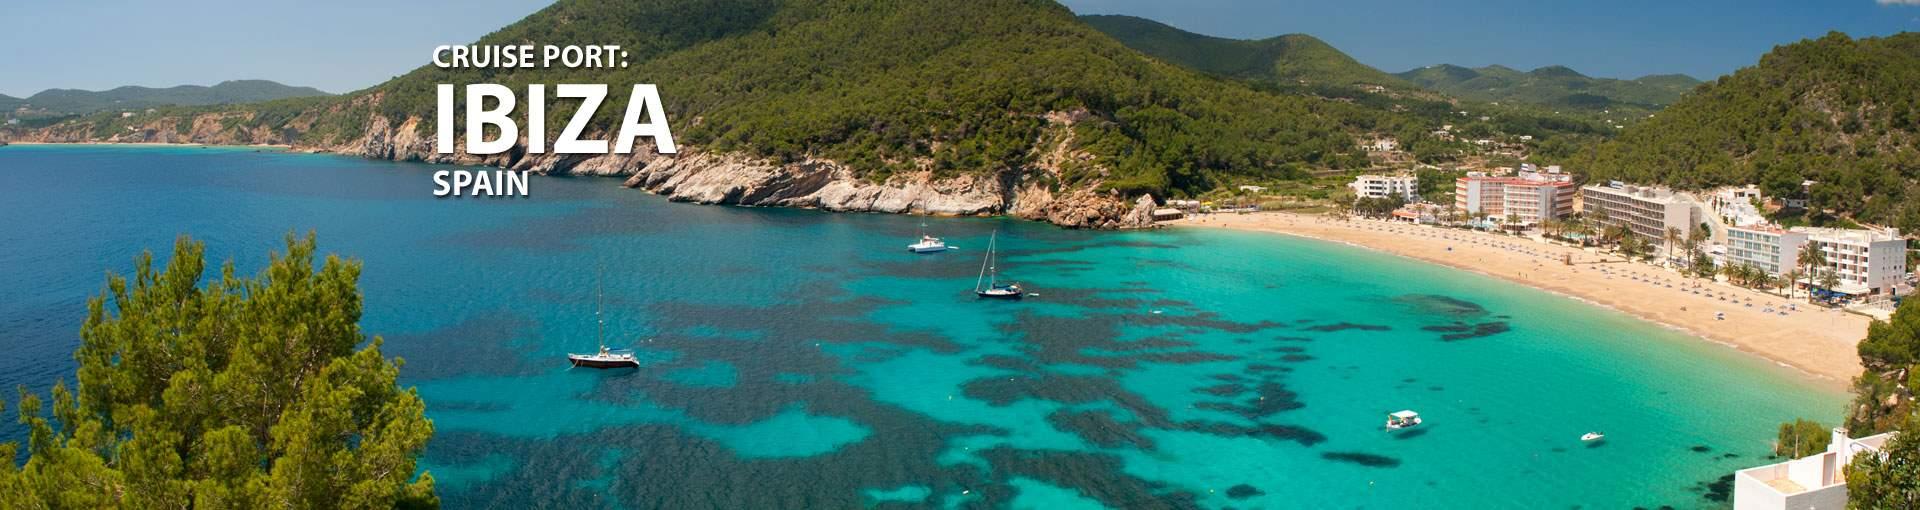 Cruises to Ibiza, Spain